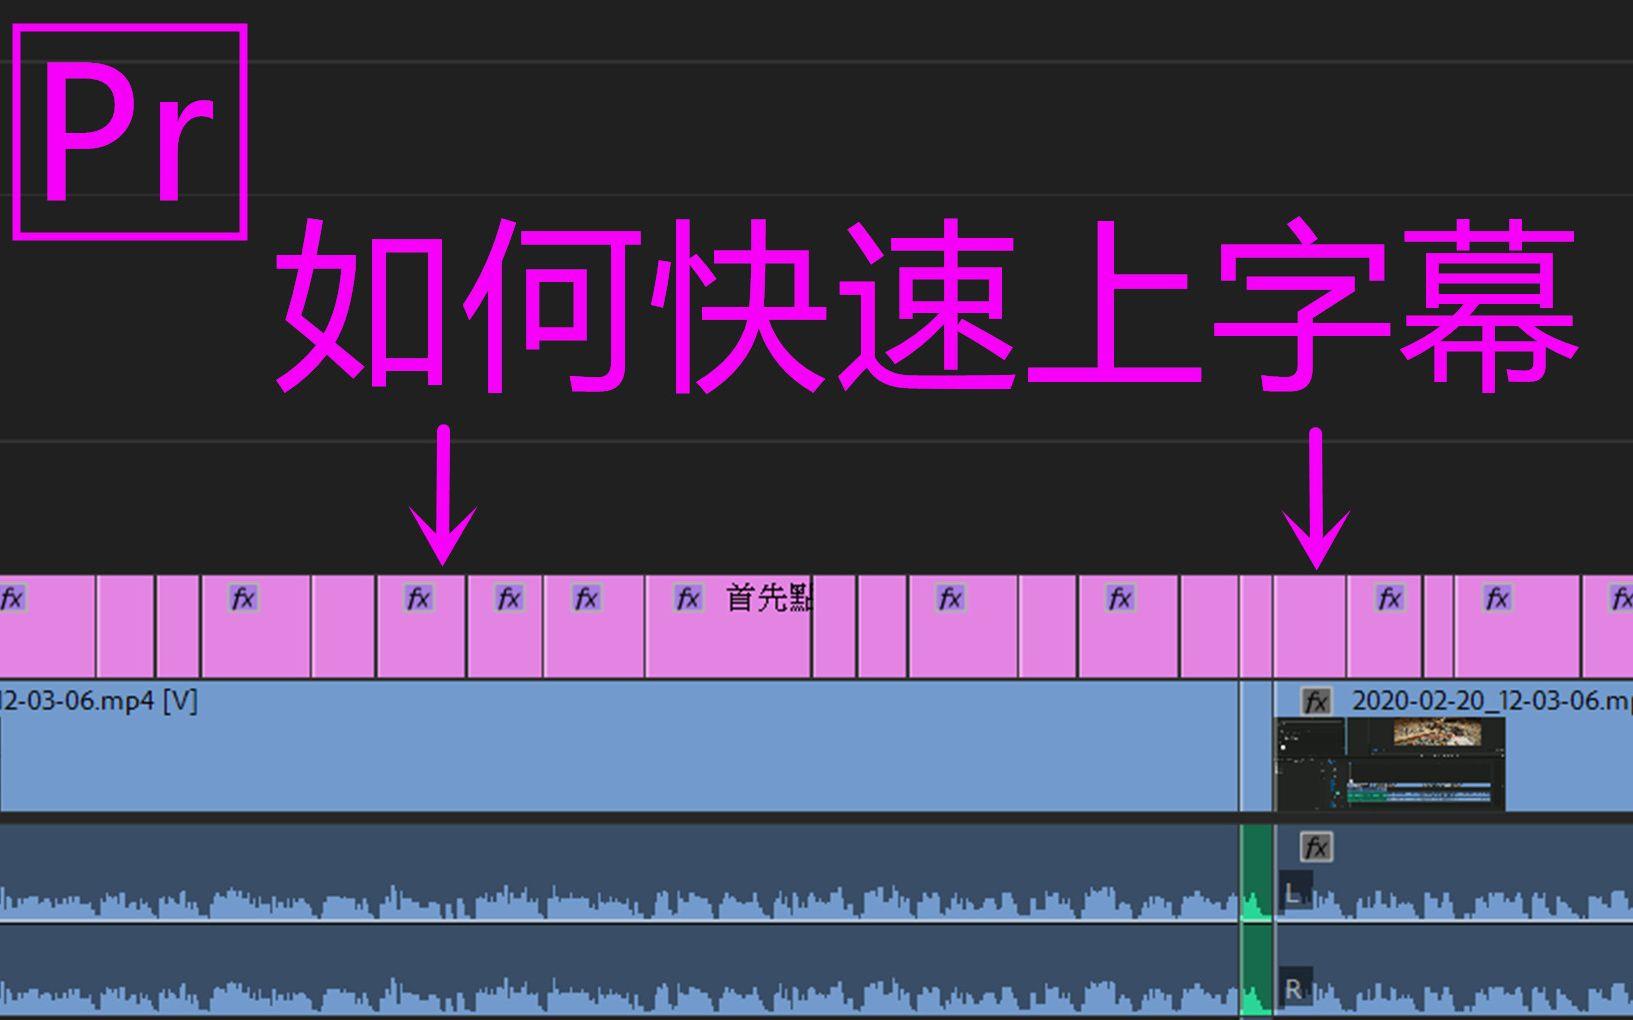 Pr如何快速給視頻上字幕簡單小技巧+為何UP的視頻和游戲經常用繁體中文字幕呢?_嗶哩嗶哩 (゜-゜)つロ 干杯 ...